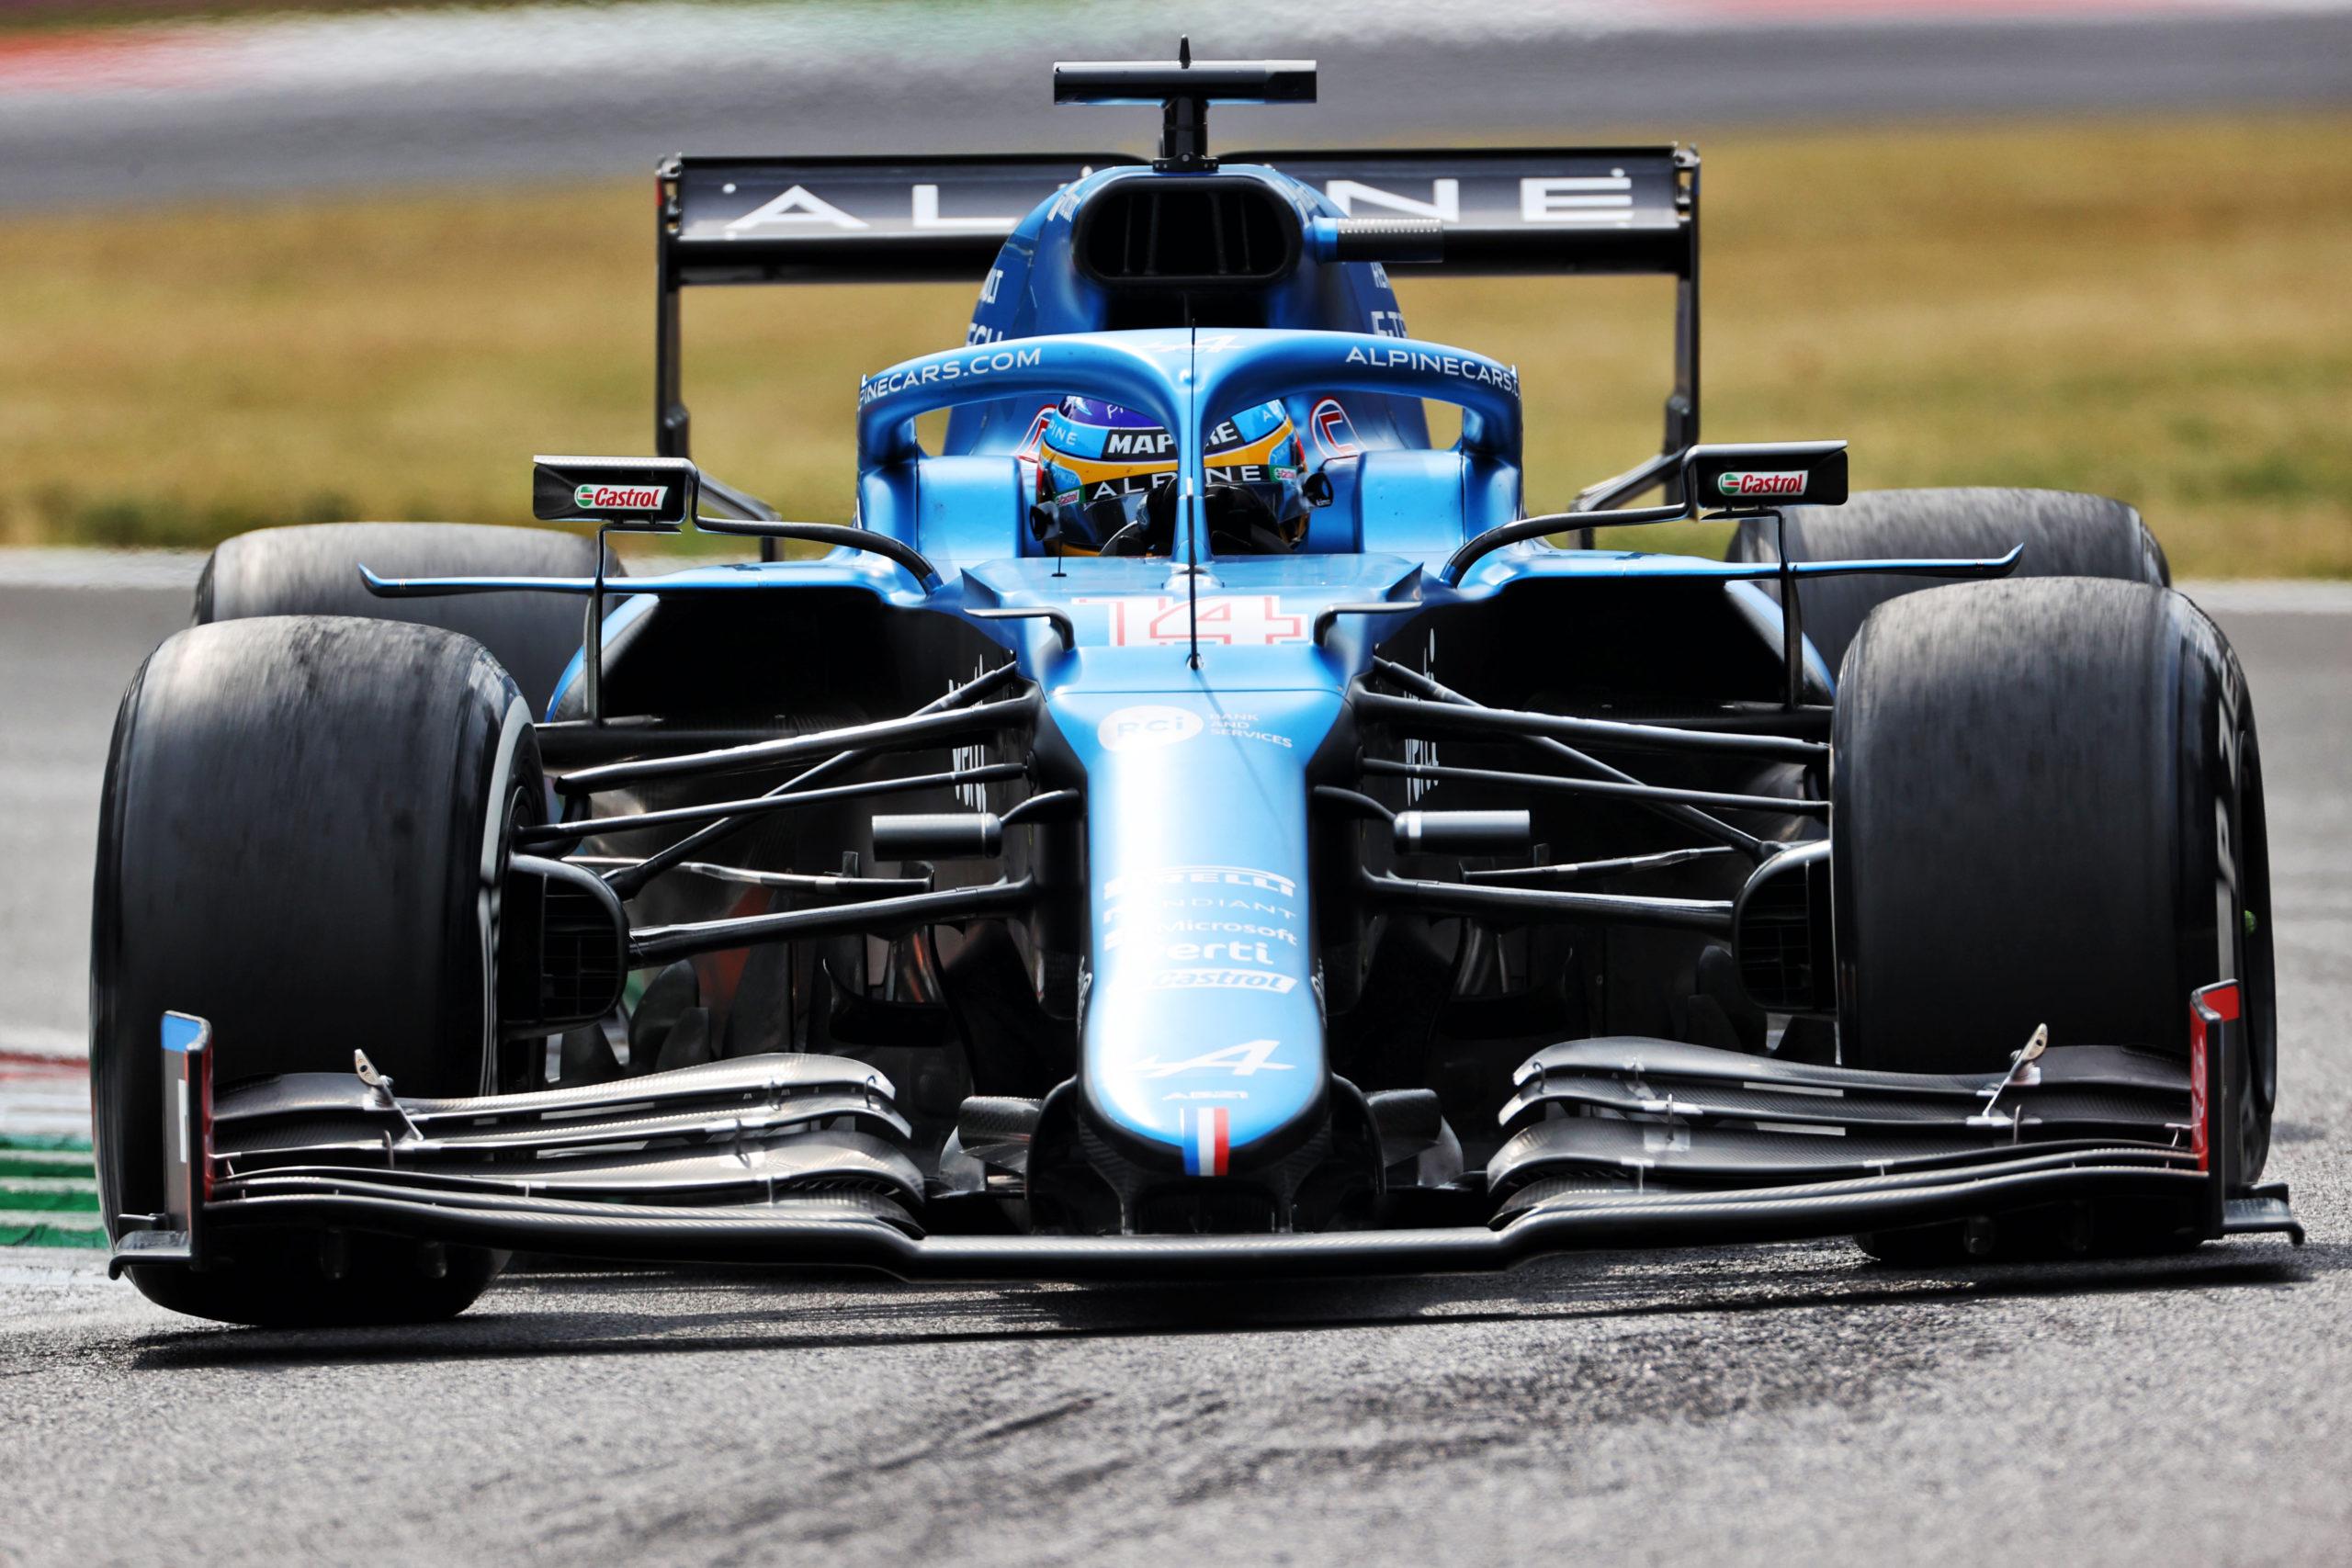 Fernando Alonso (ESP), Alpine F1 Team A521, F1 Italian Grand Prix at Monza, 2021. Copyright: Alpine Media